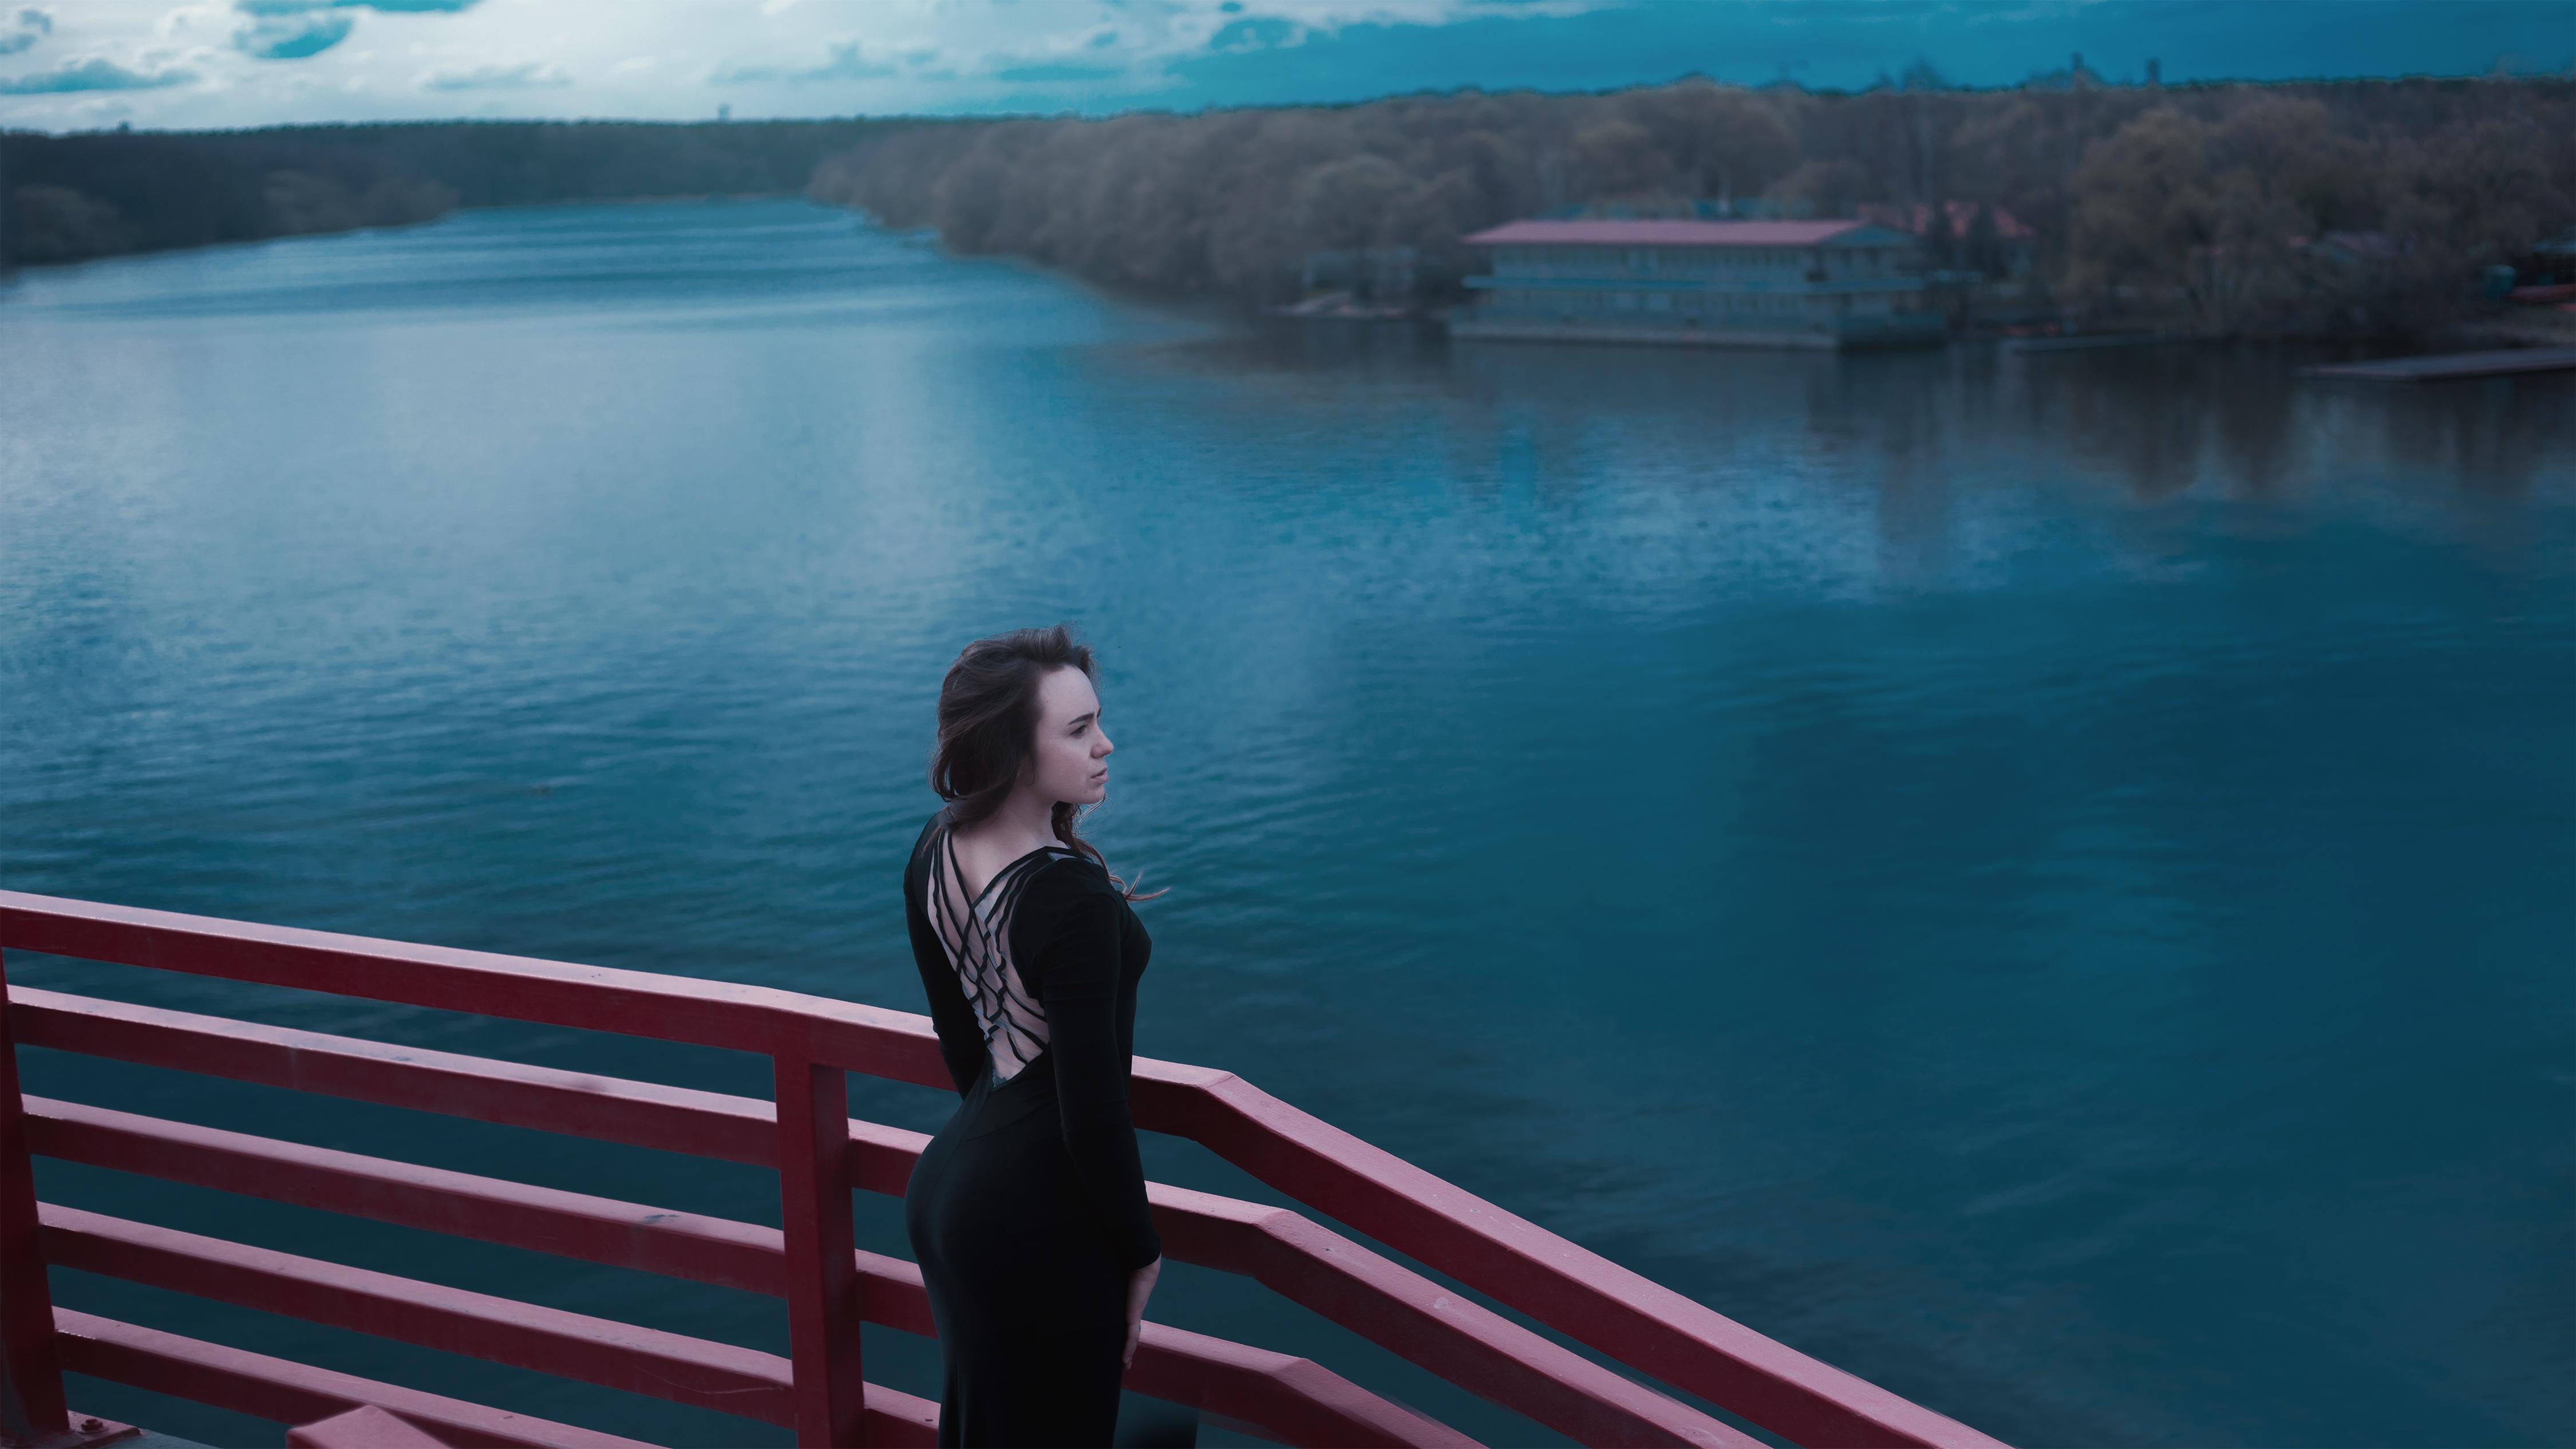 Black dress with a slit photo